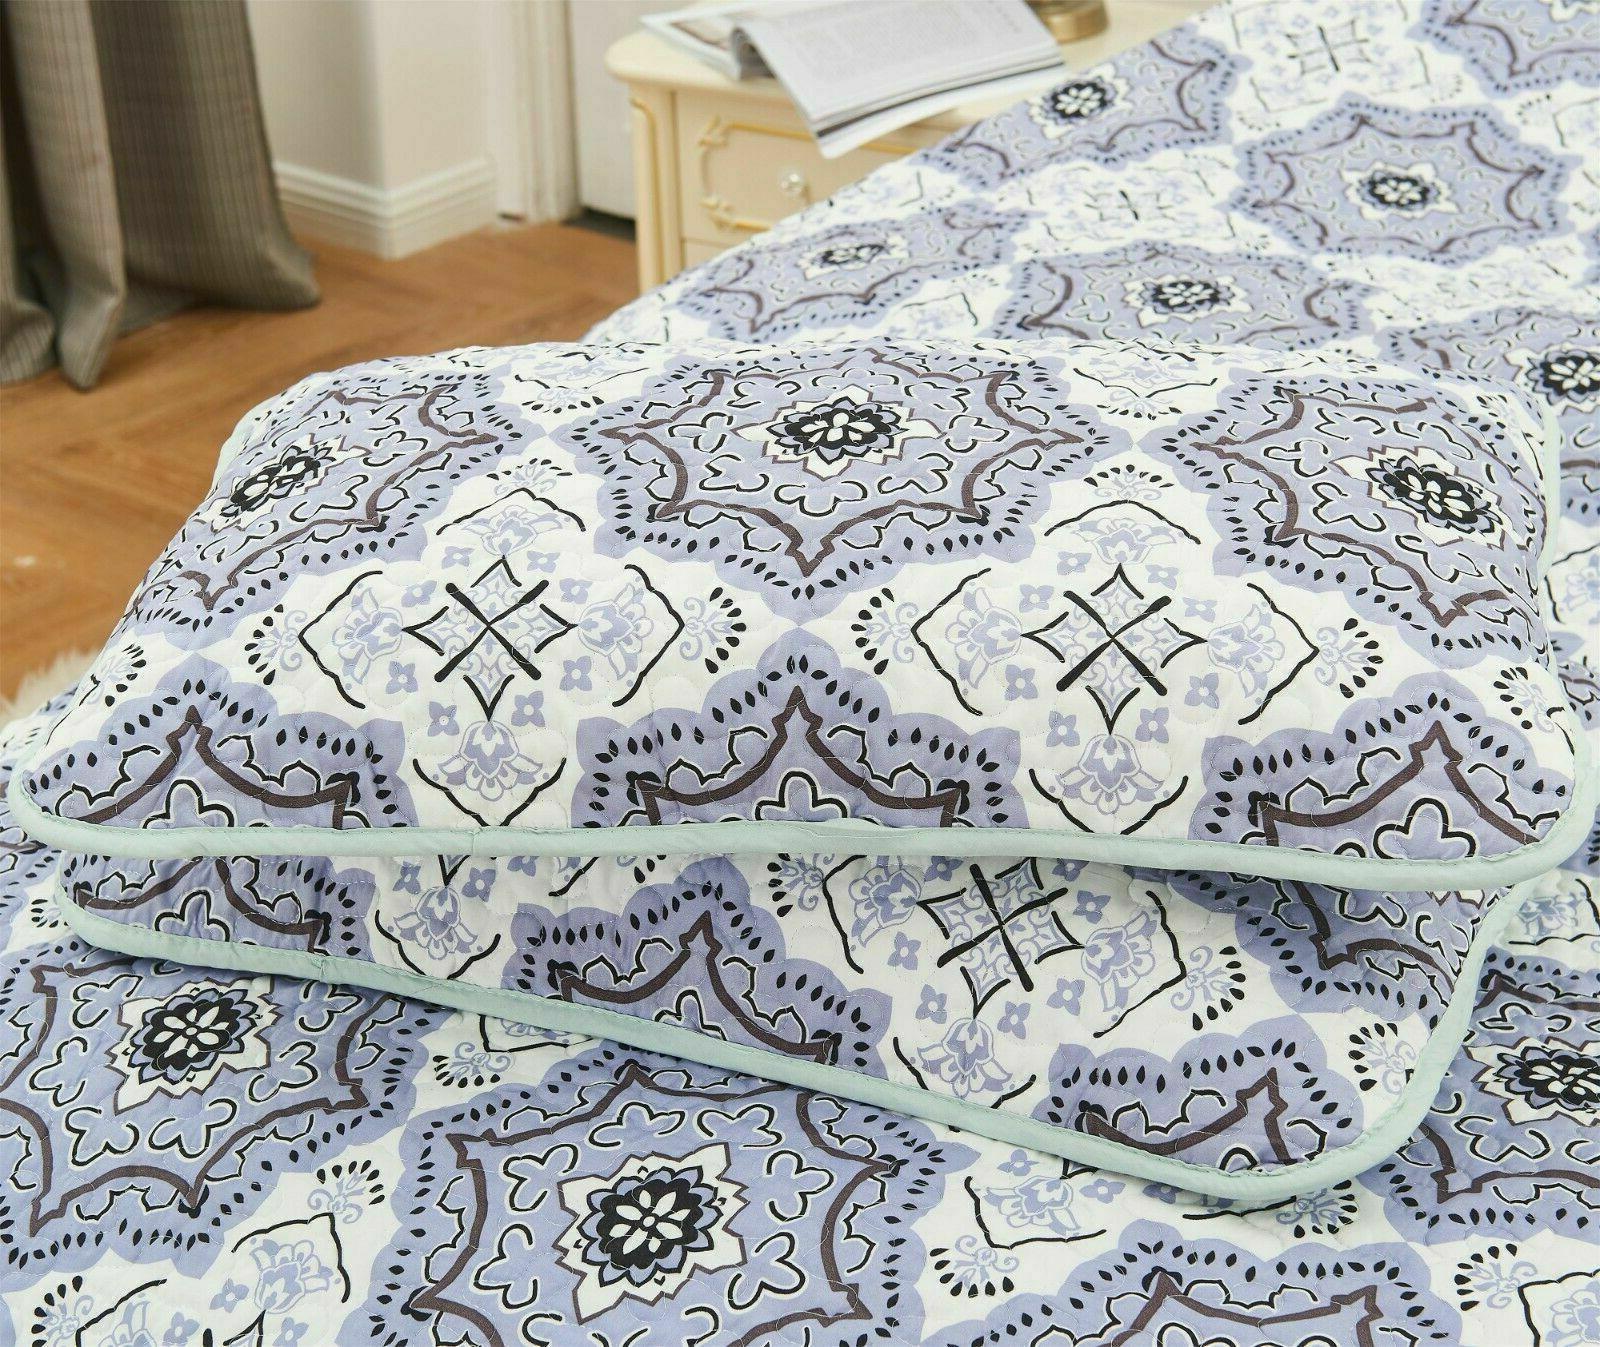 4 Set Printed Pattern King Queen Set Pillows